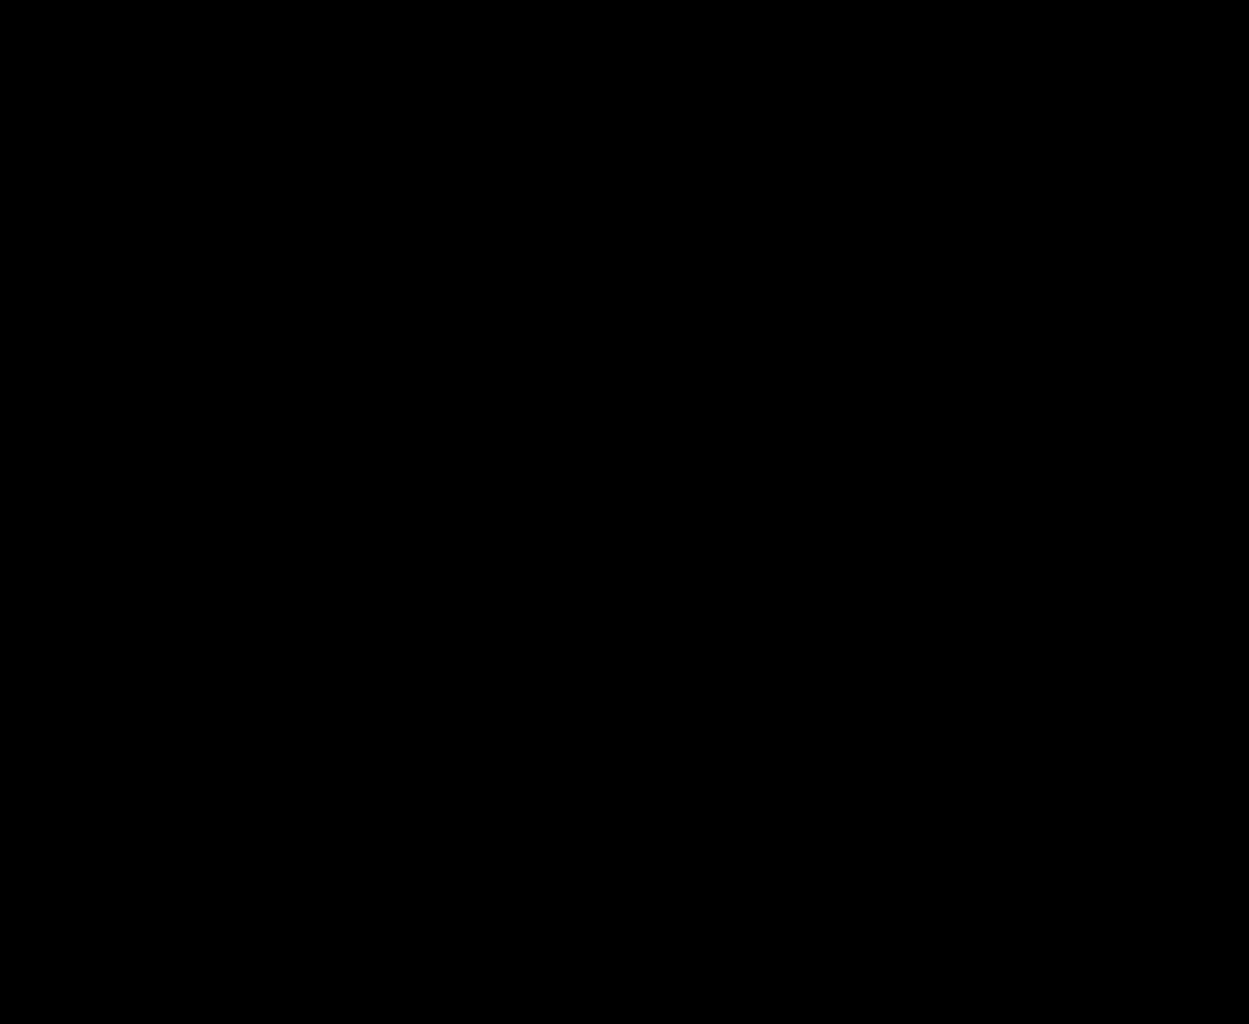 1249x1024 Video Game Controller Clip Art